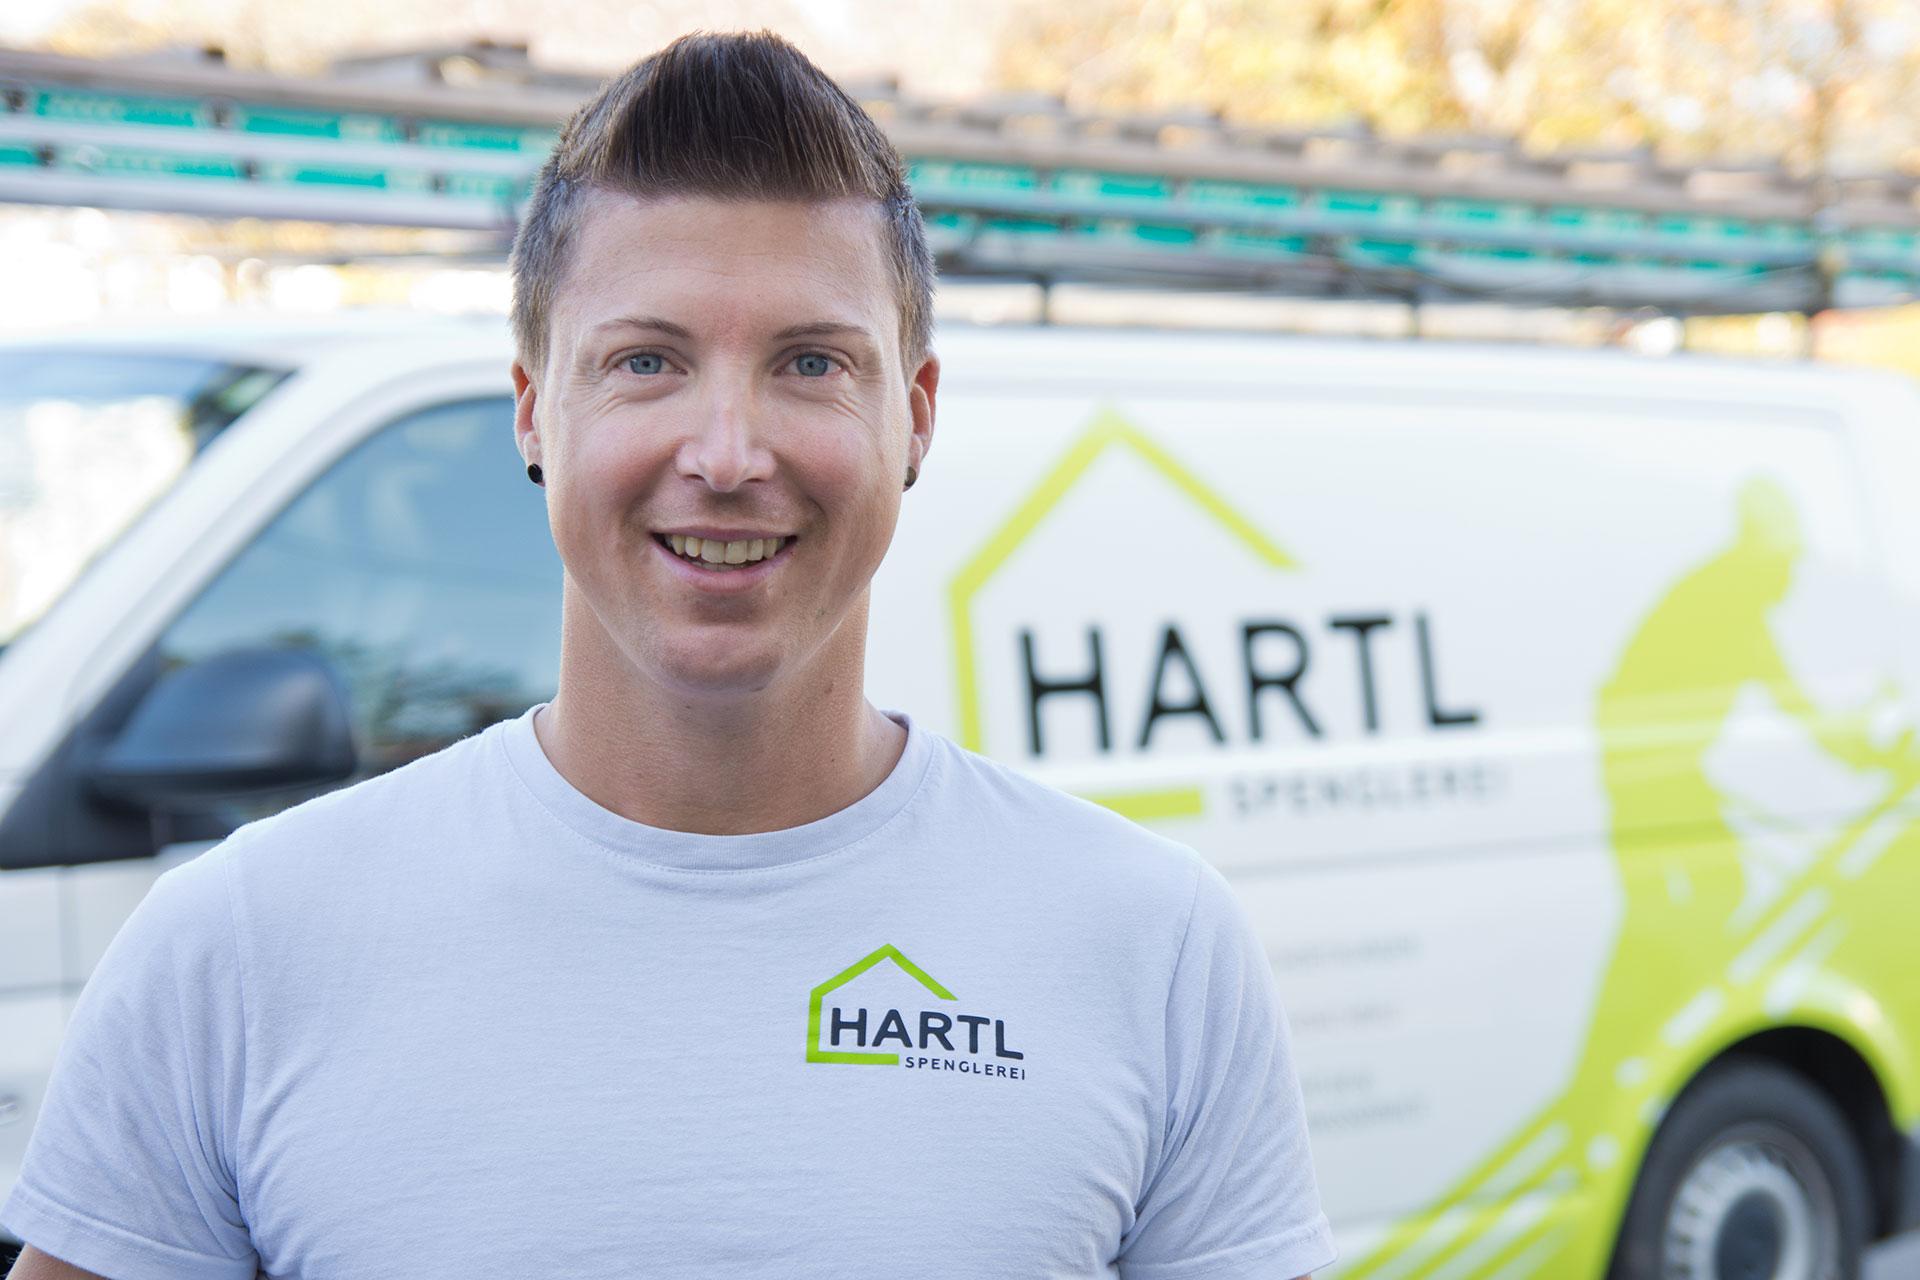 Josef Hartl